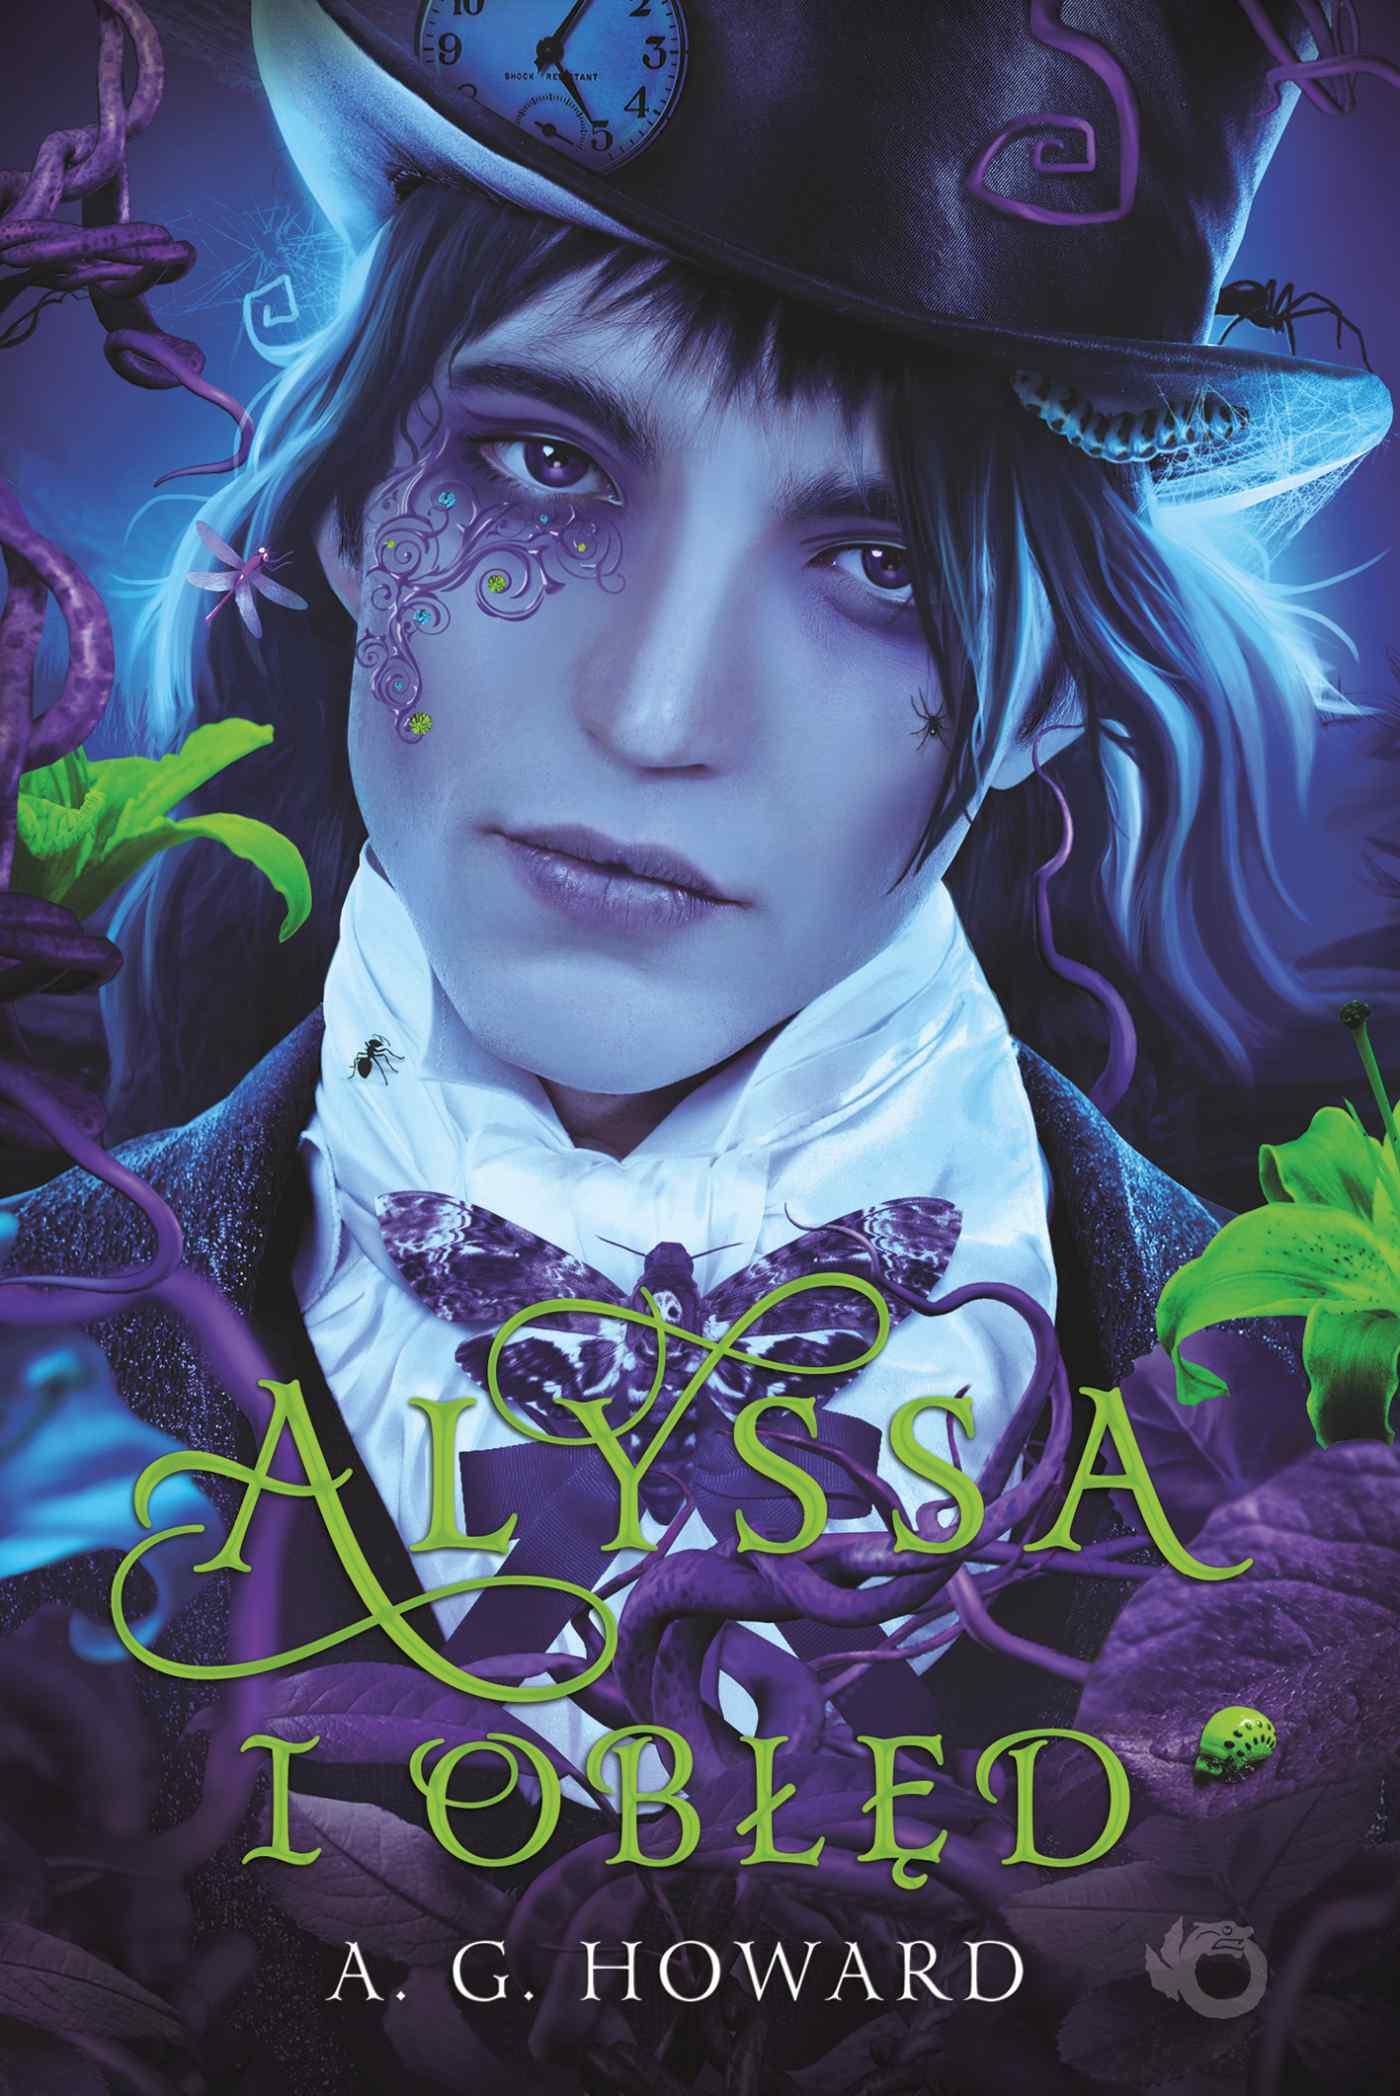 Alyssa z innej krainy. Alyssa i obłęd. Tom 2 - Ebook (Książka na Kindle) do pobrania w formacie MOBI